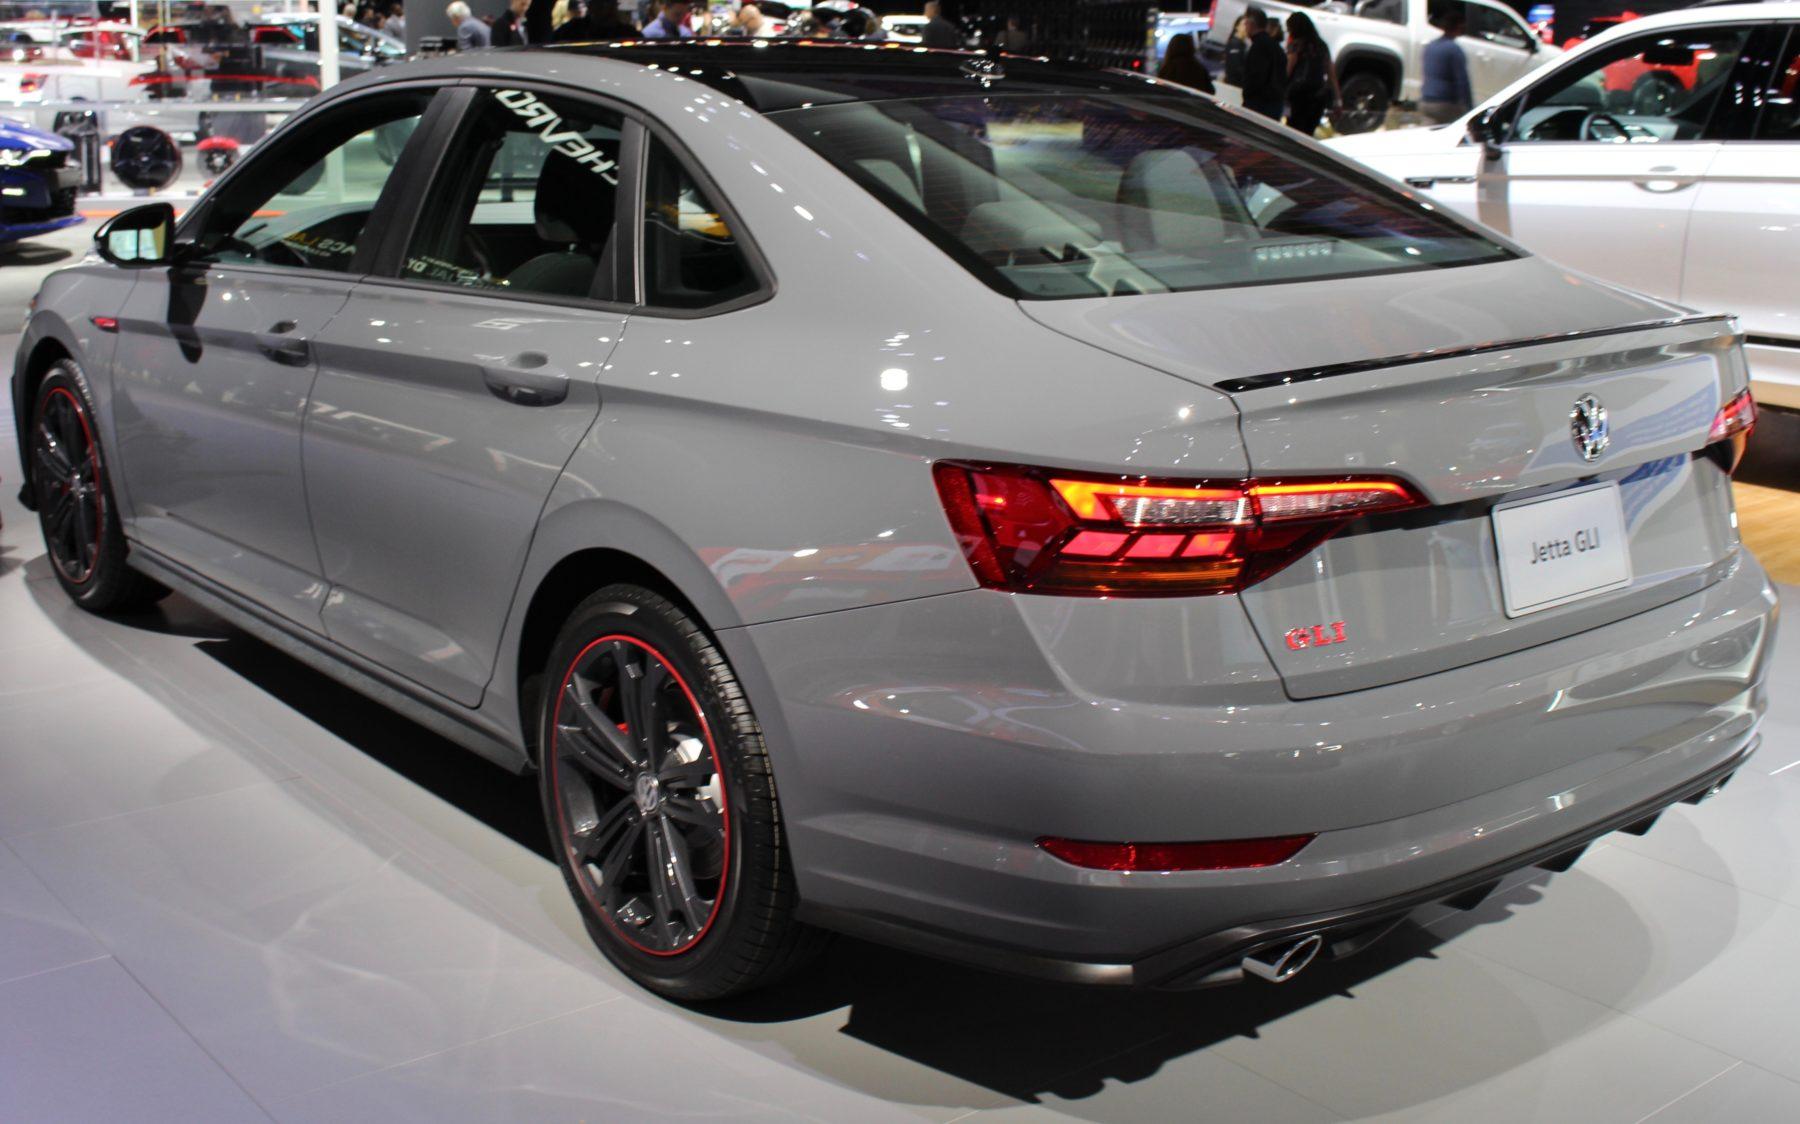 Volkswagen GLI